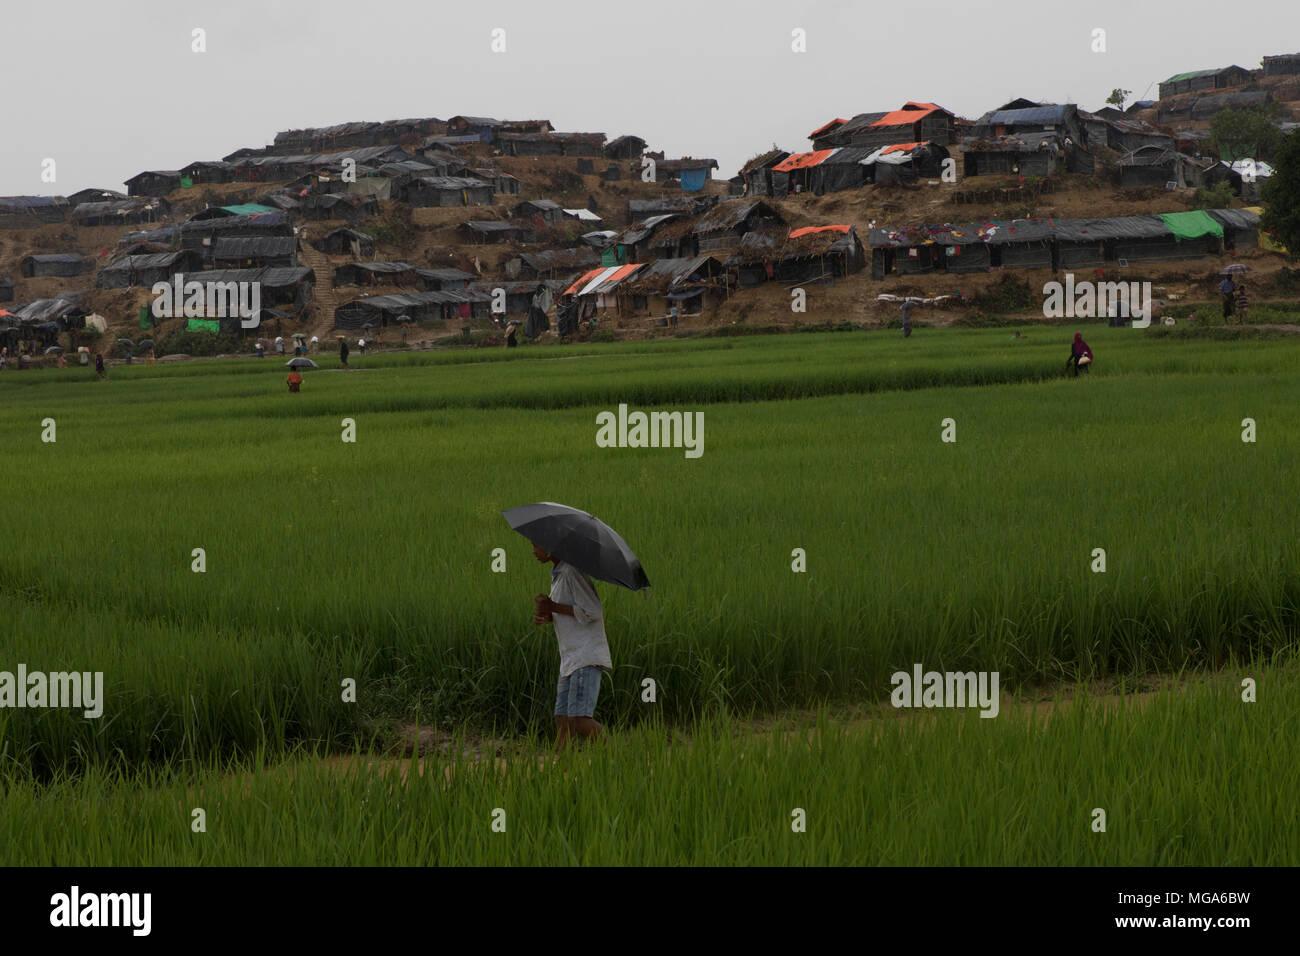 The Rohingya refugee crisis in Bangladesh - Stock Image